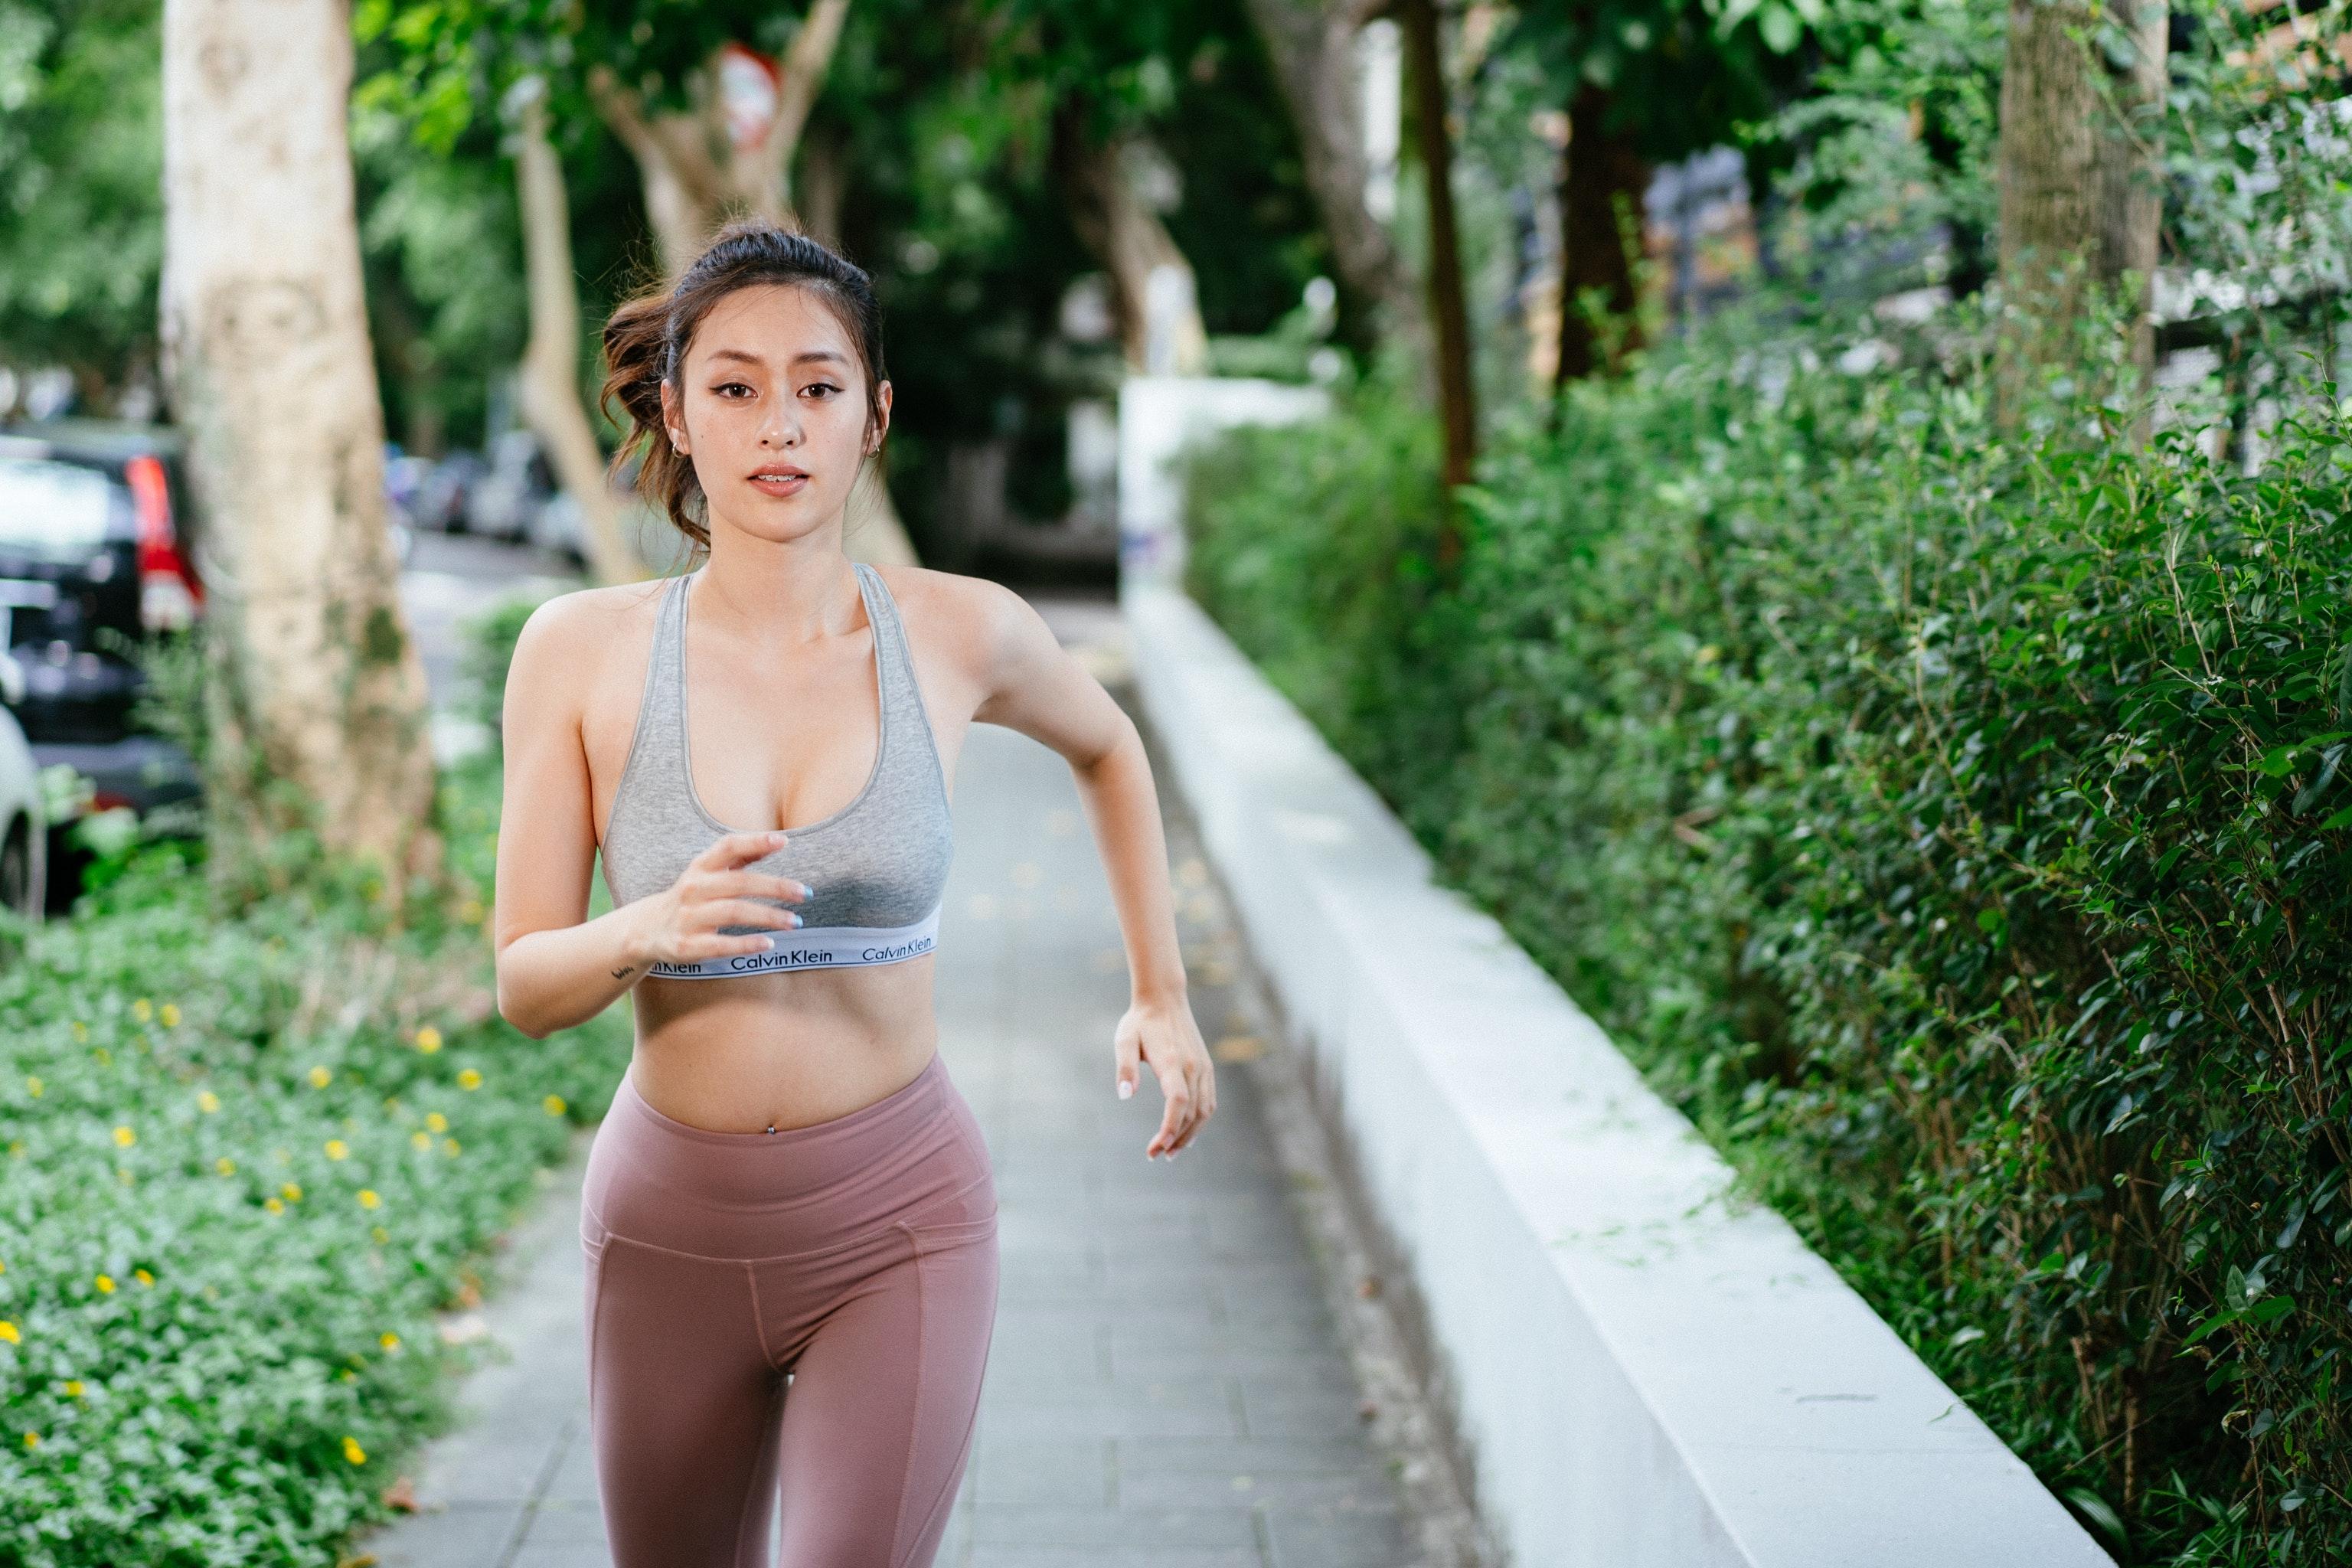 photo-of-woman-running-2824020